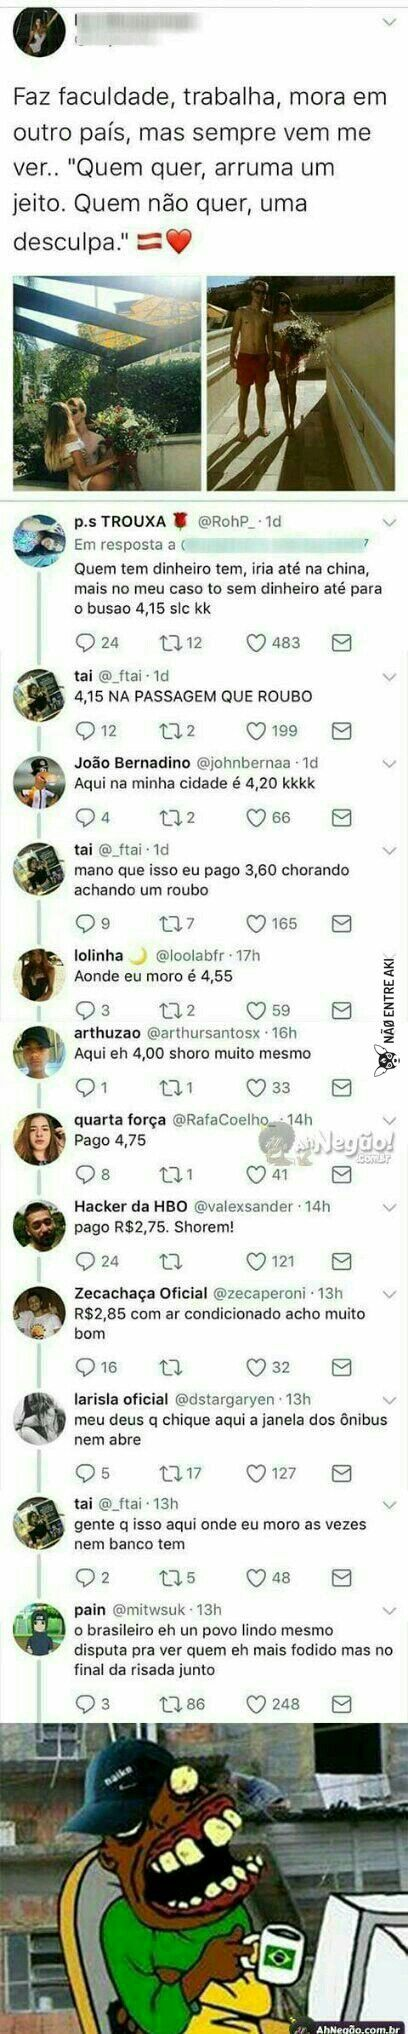 O bom do Brasil é os brasileiros